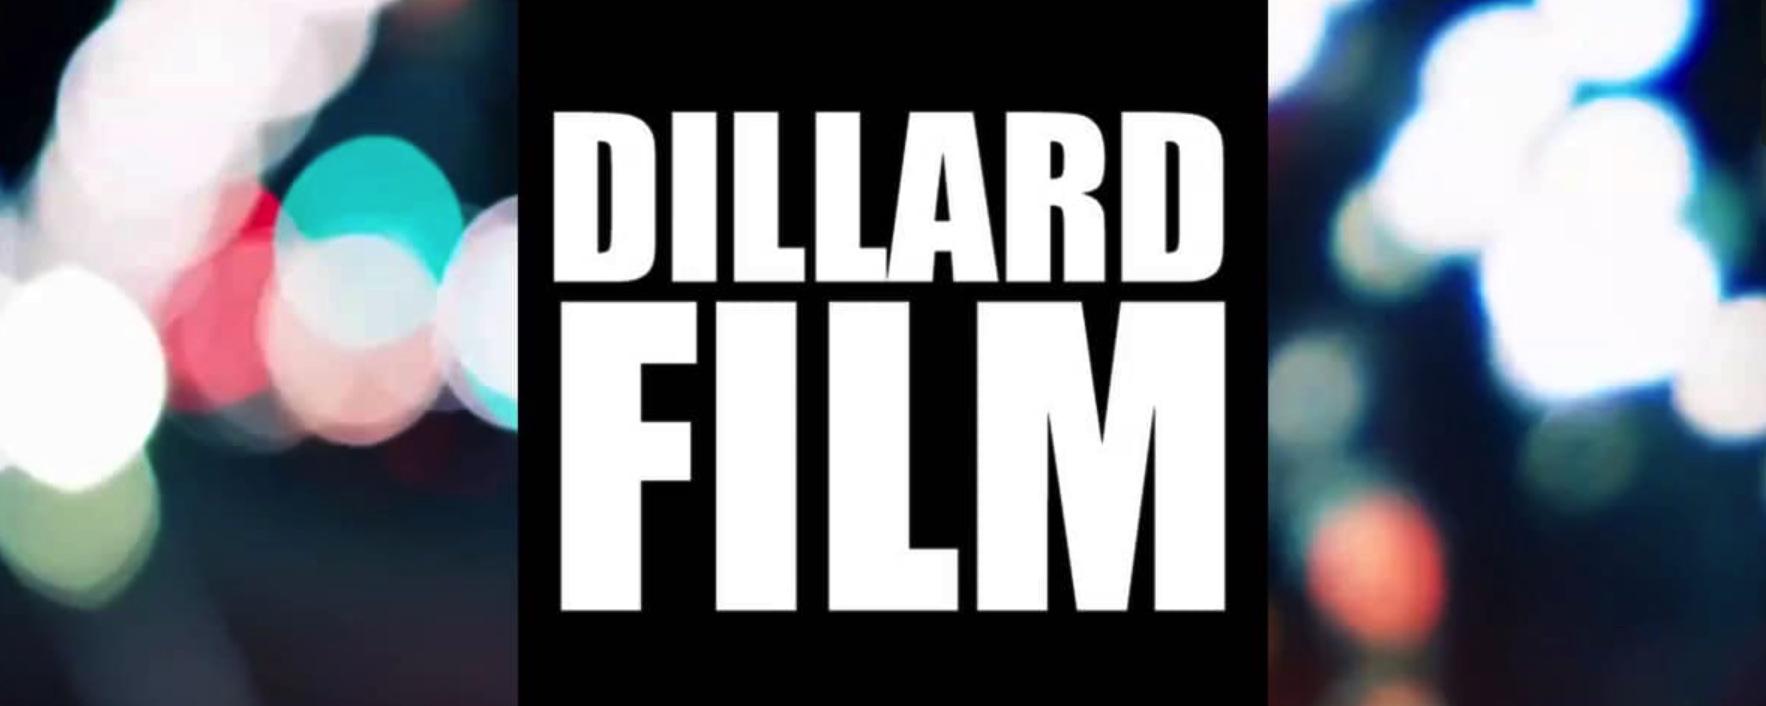 Dillard Film vimeo cropped.jpg